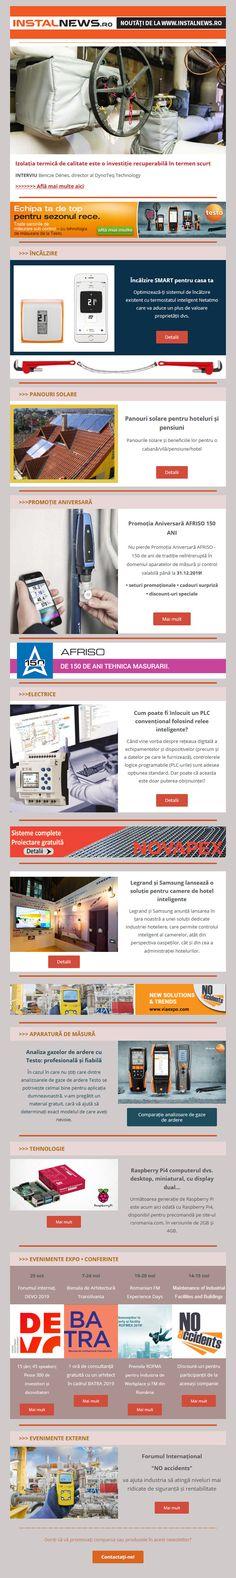 Newsletter InstalNews nr. 164, Octombrie 2019 Web Design, Branding, Design Web, Brand Management, Identity Branding, Website Designs, Site Design